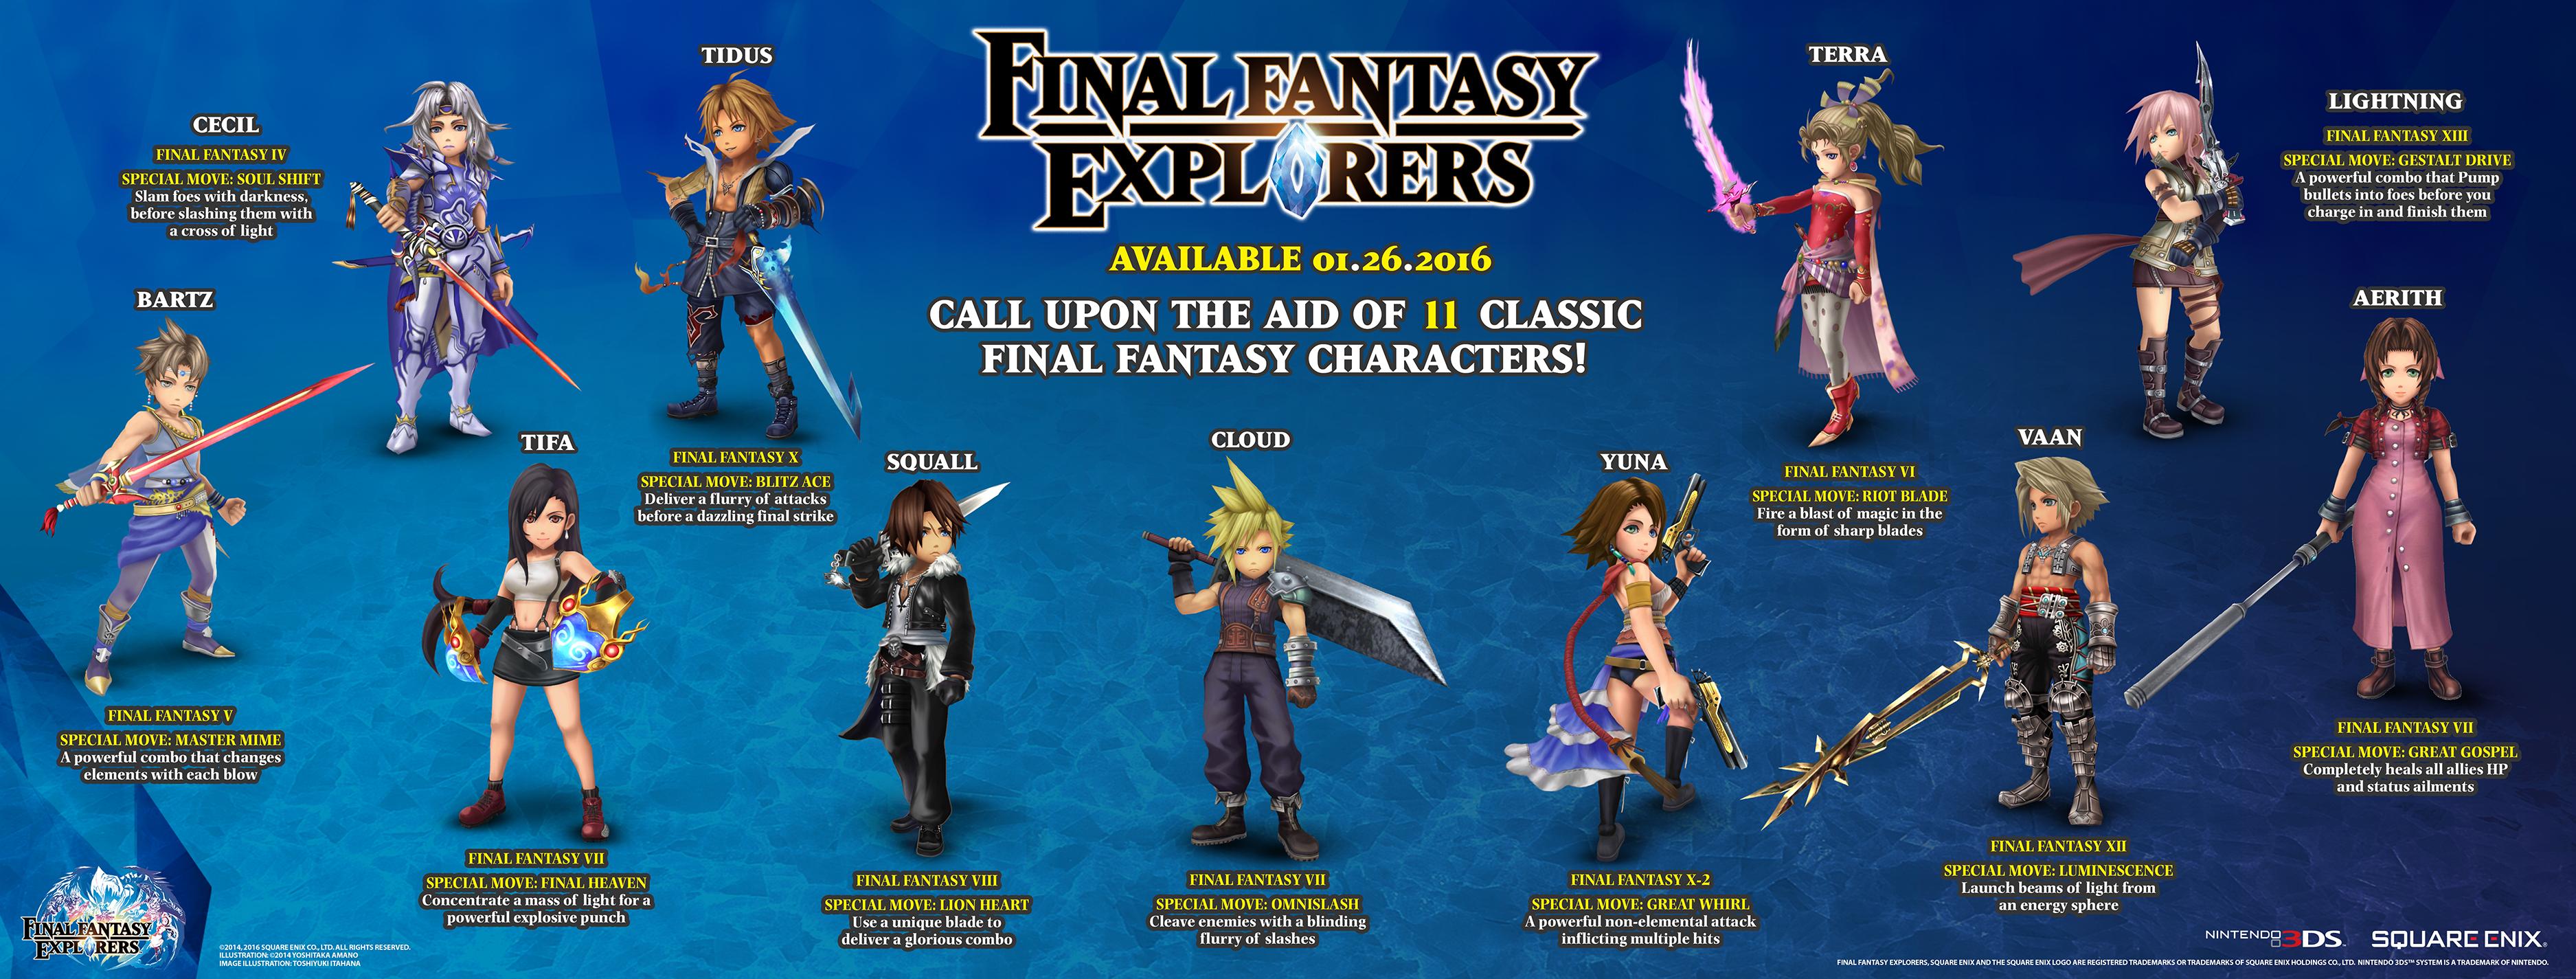 Final-Fantasy-Explorers-200116-001